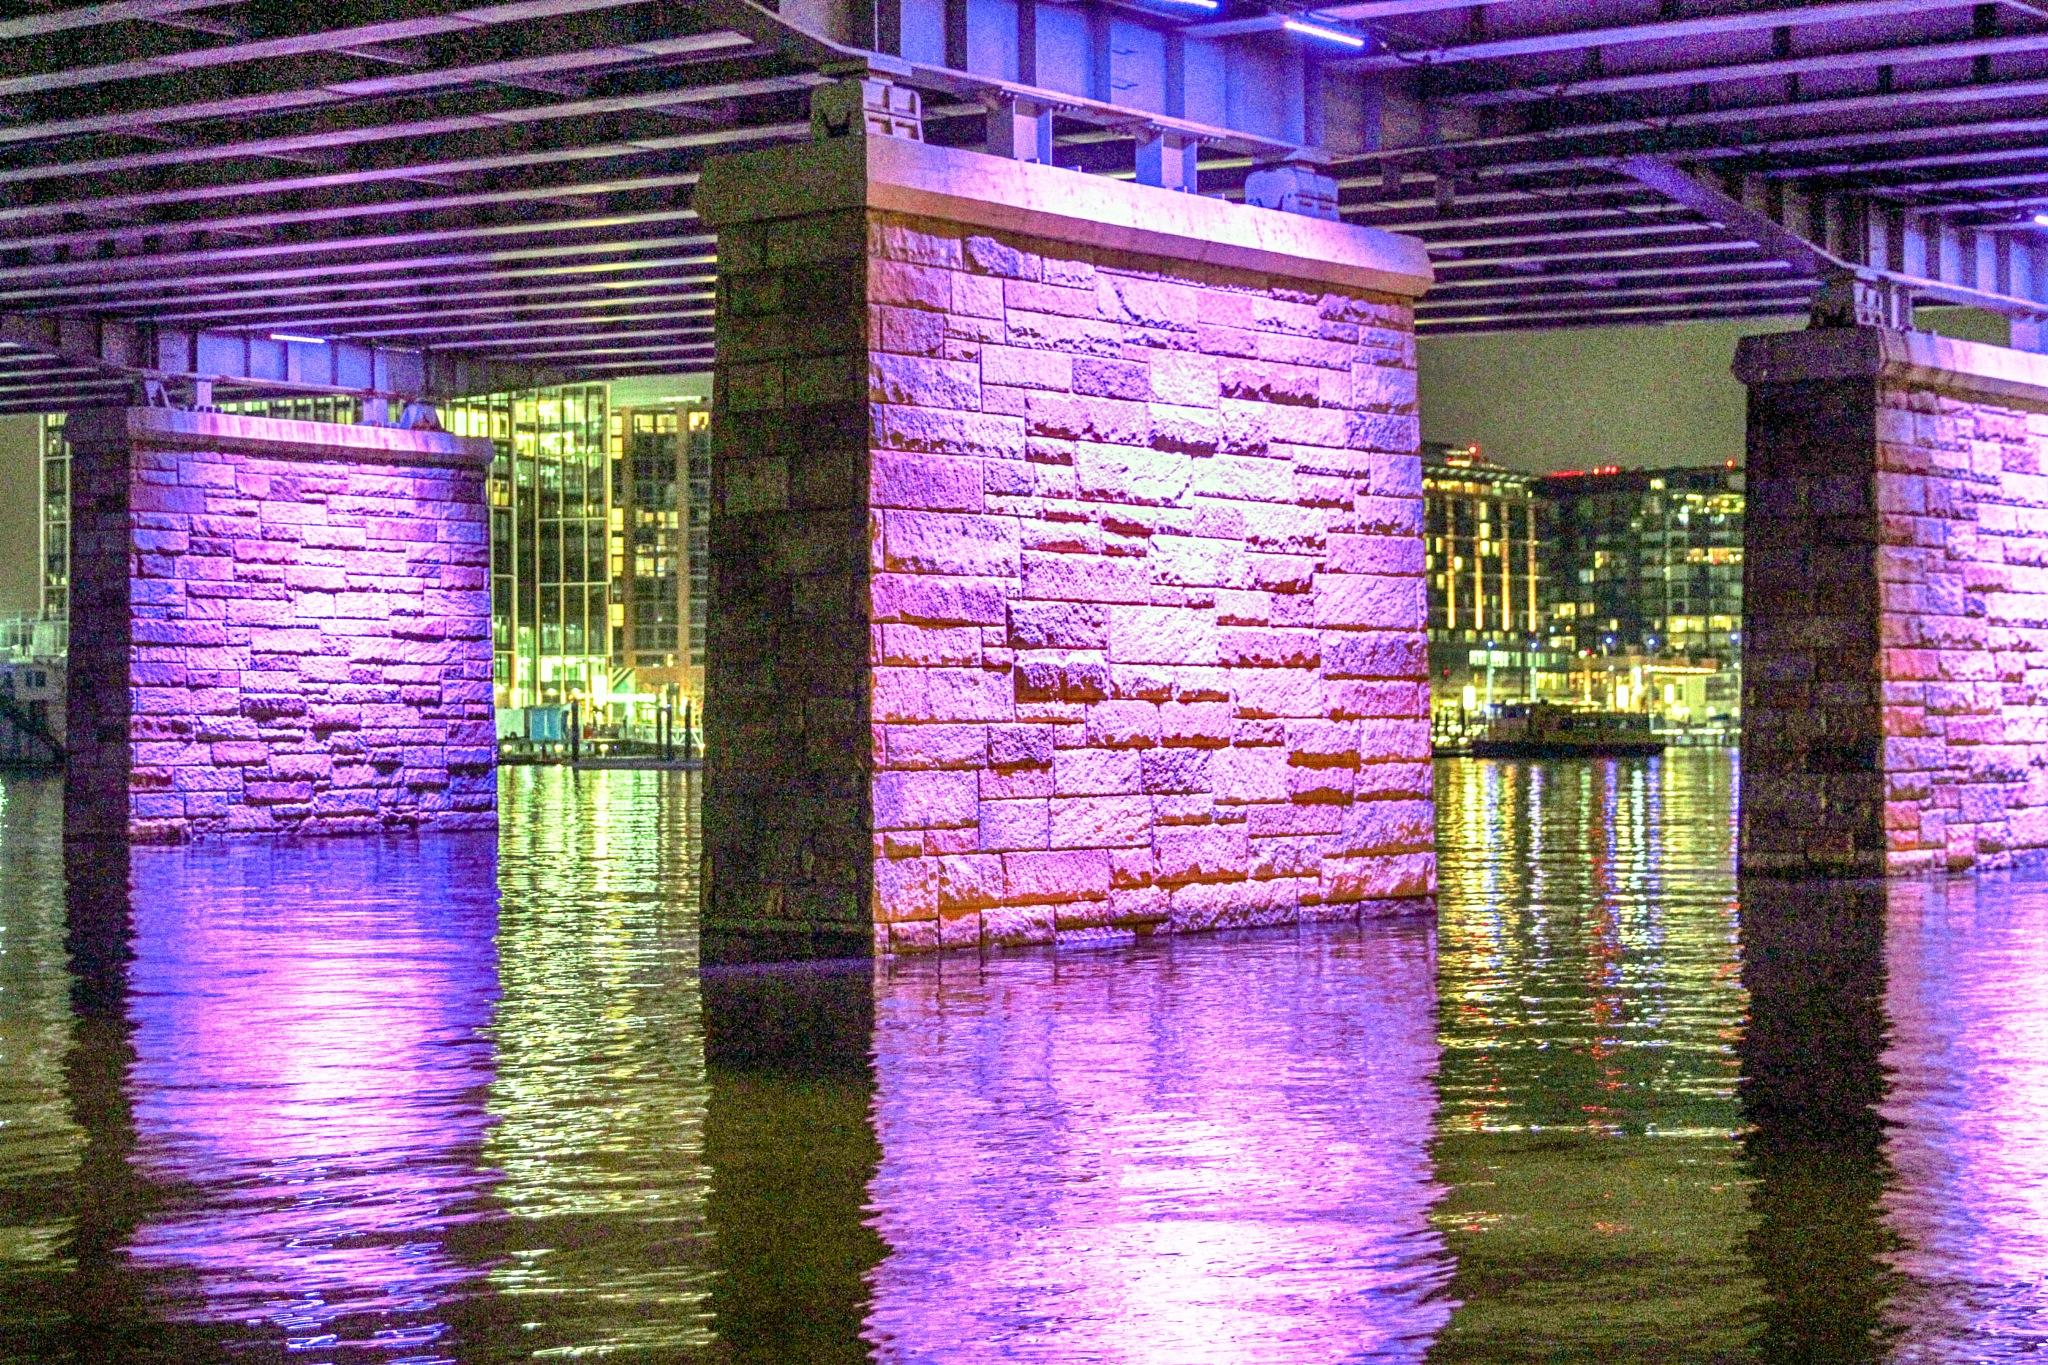 Under I-395/The Wharf/Washington, DC/2018 by aemdigitalphotography